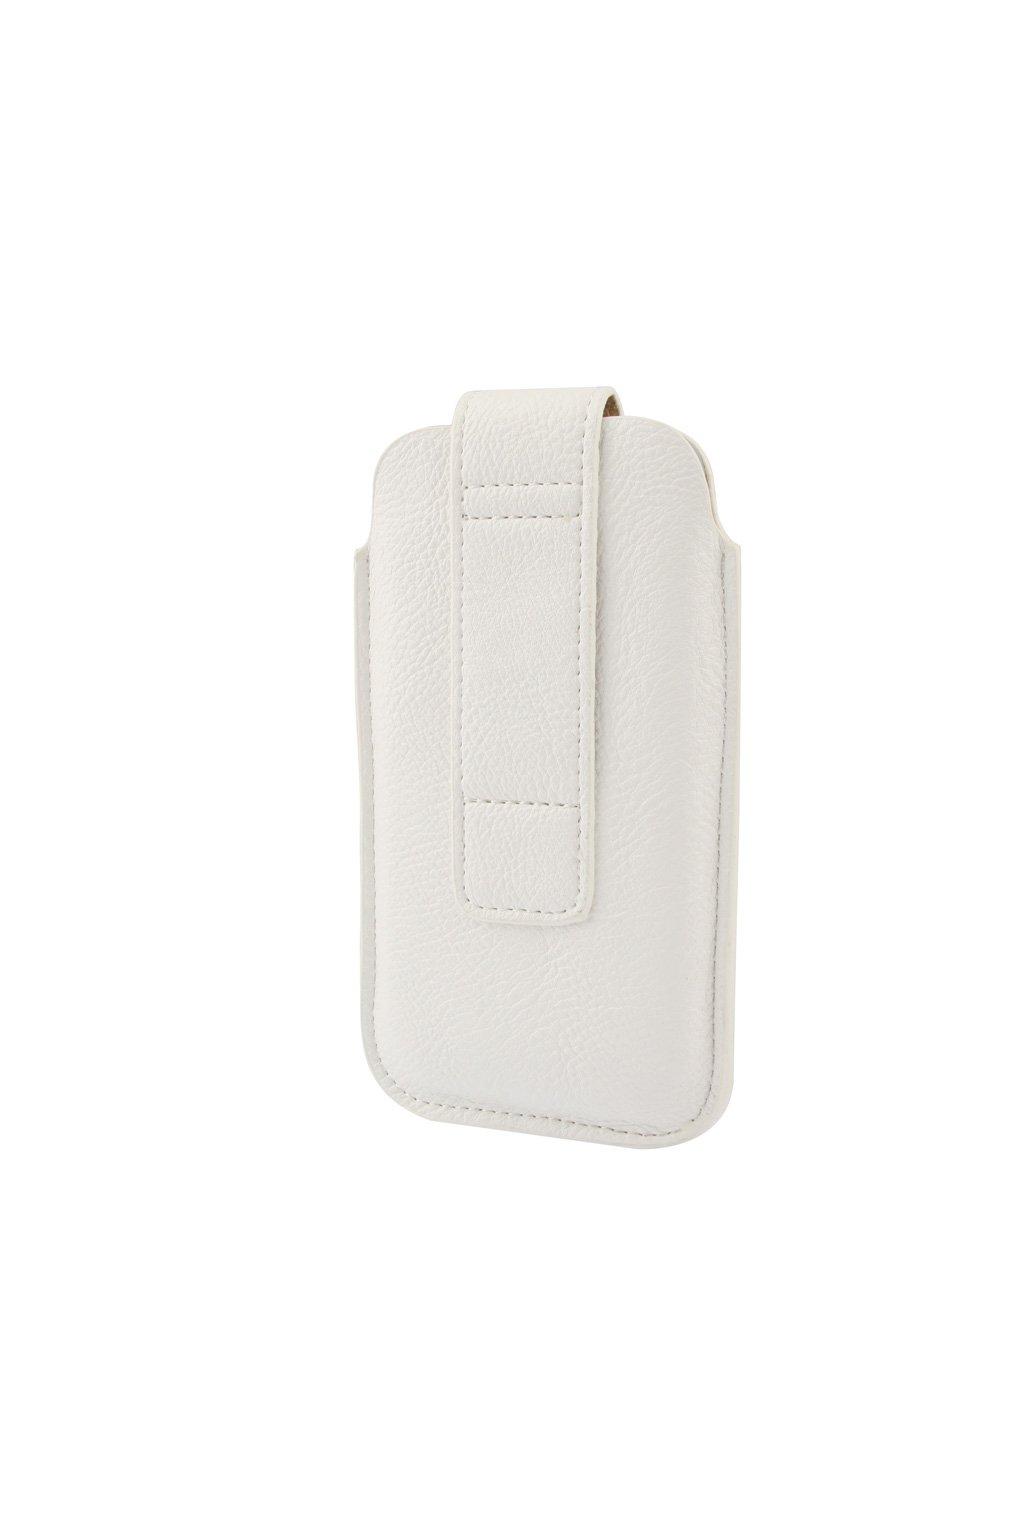 Pouzdro kapsa PU koženkové Apple iPhone 6/6S/7/8, white